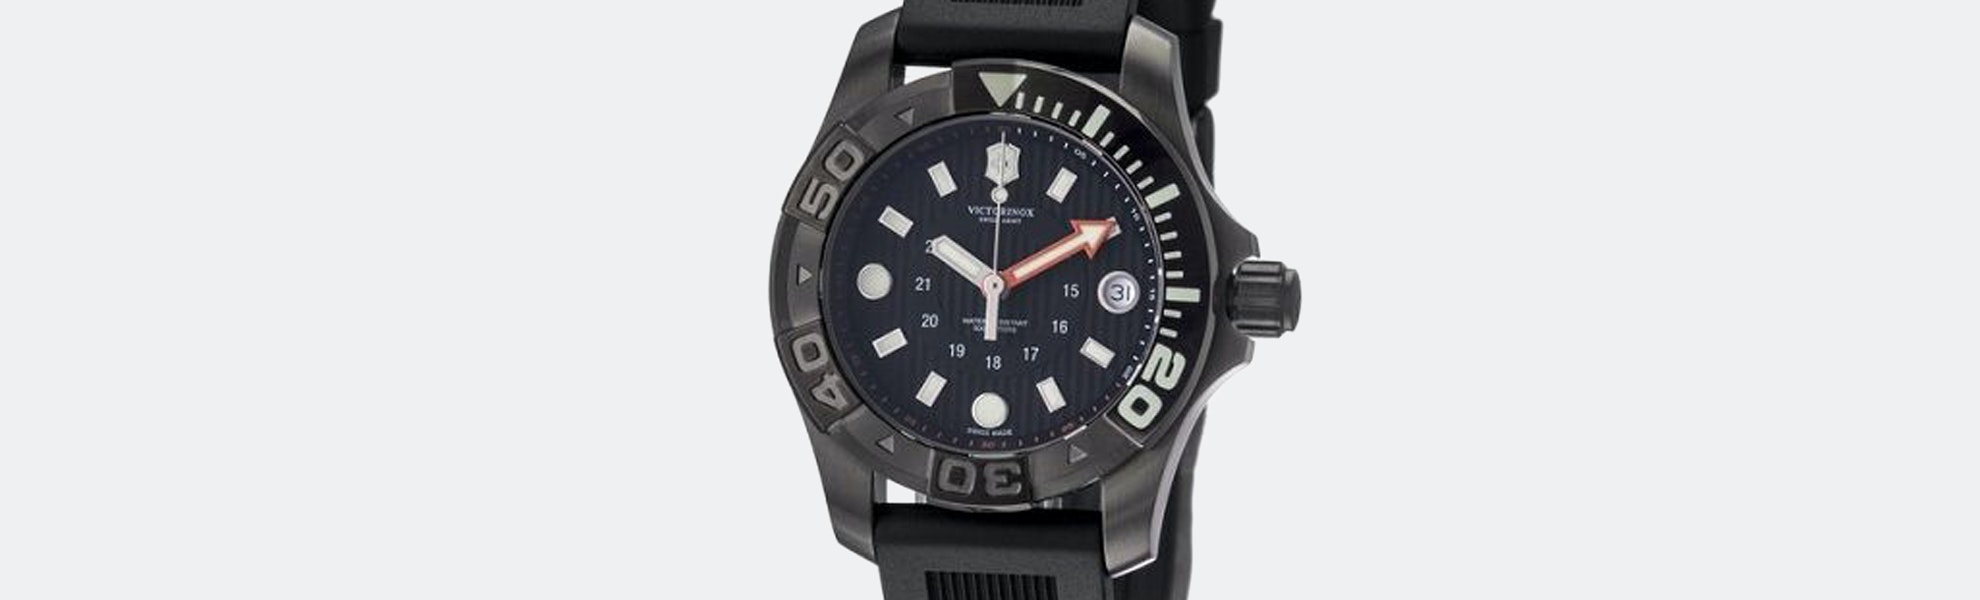 Victorinox Dive Master 500 Mid-Size Quartz Watch